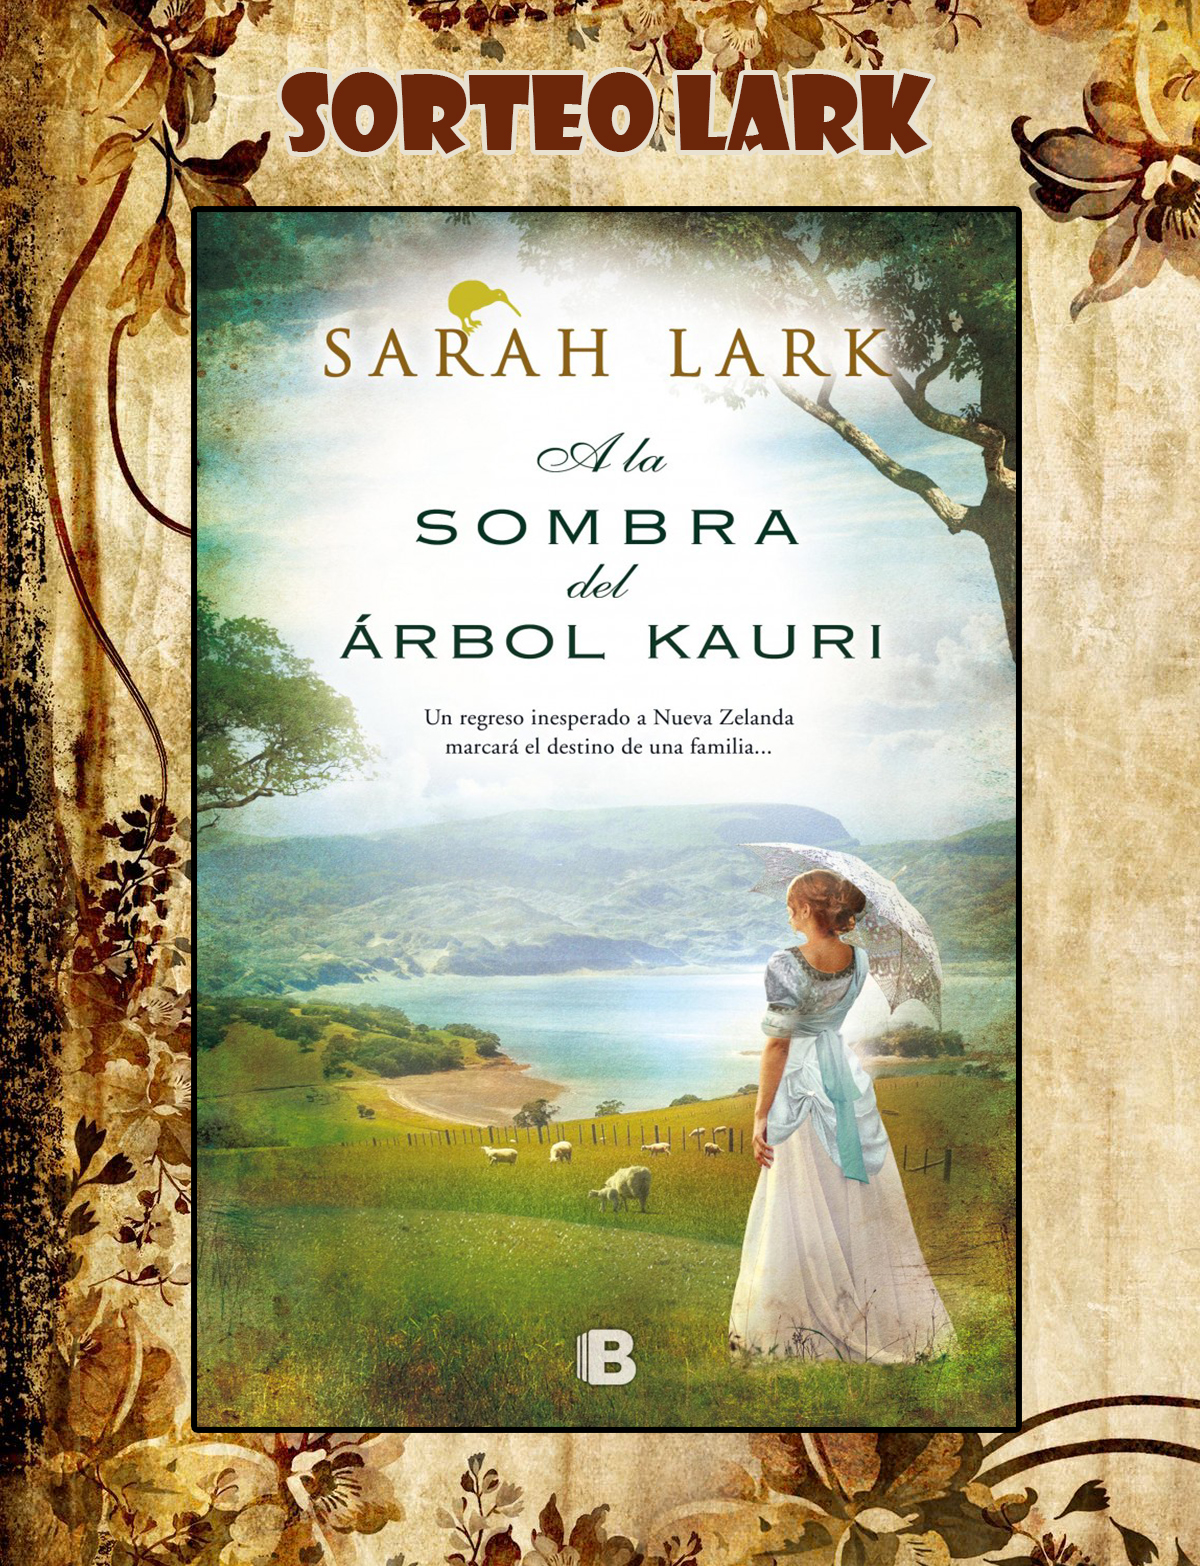 Sorteo Kauri Sarah Lark